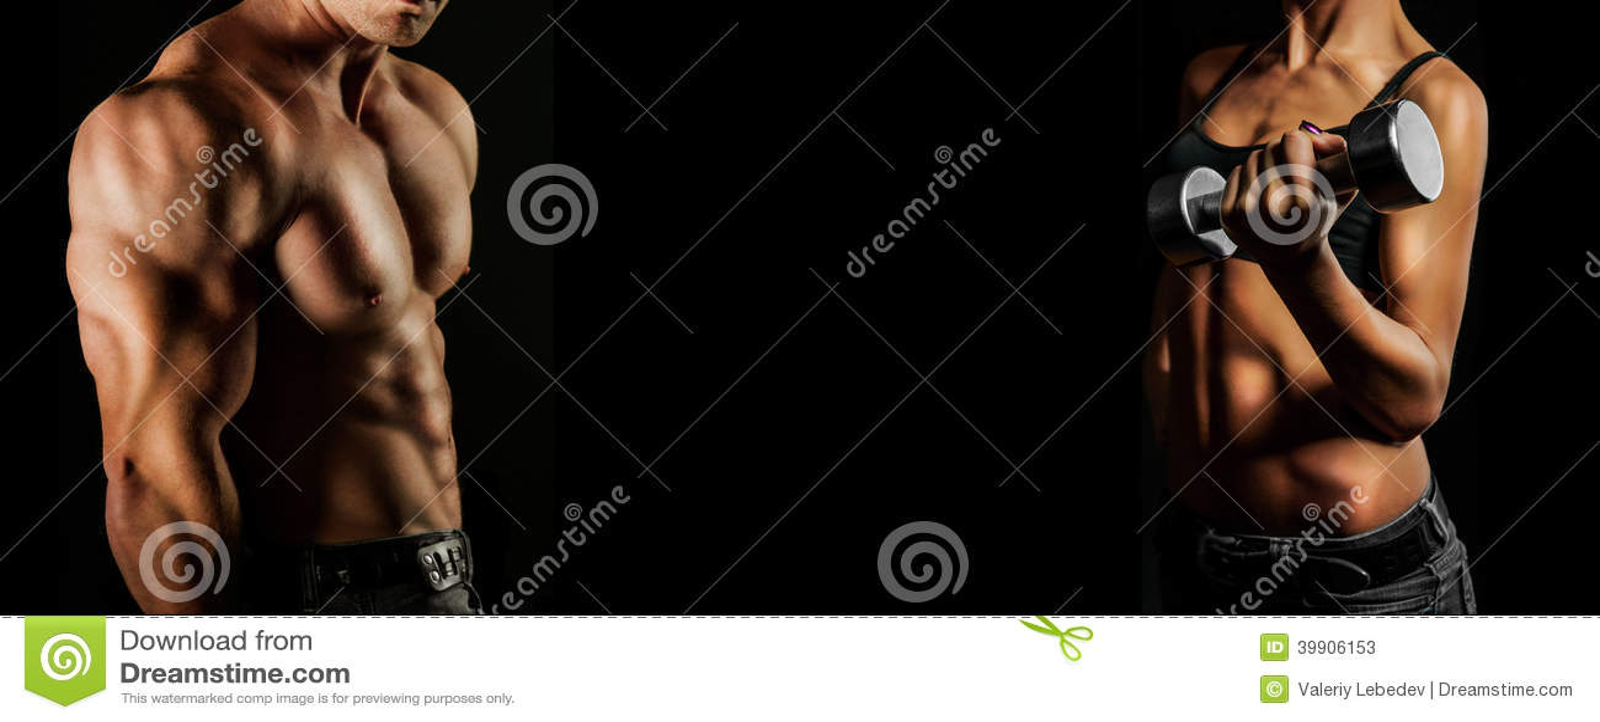 Bodybuilding. Άνδρας και γυναίκα